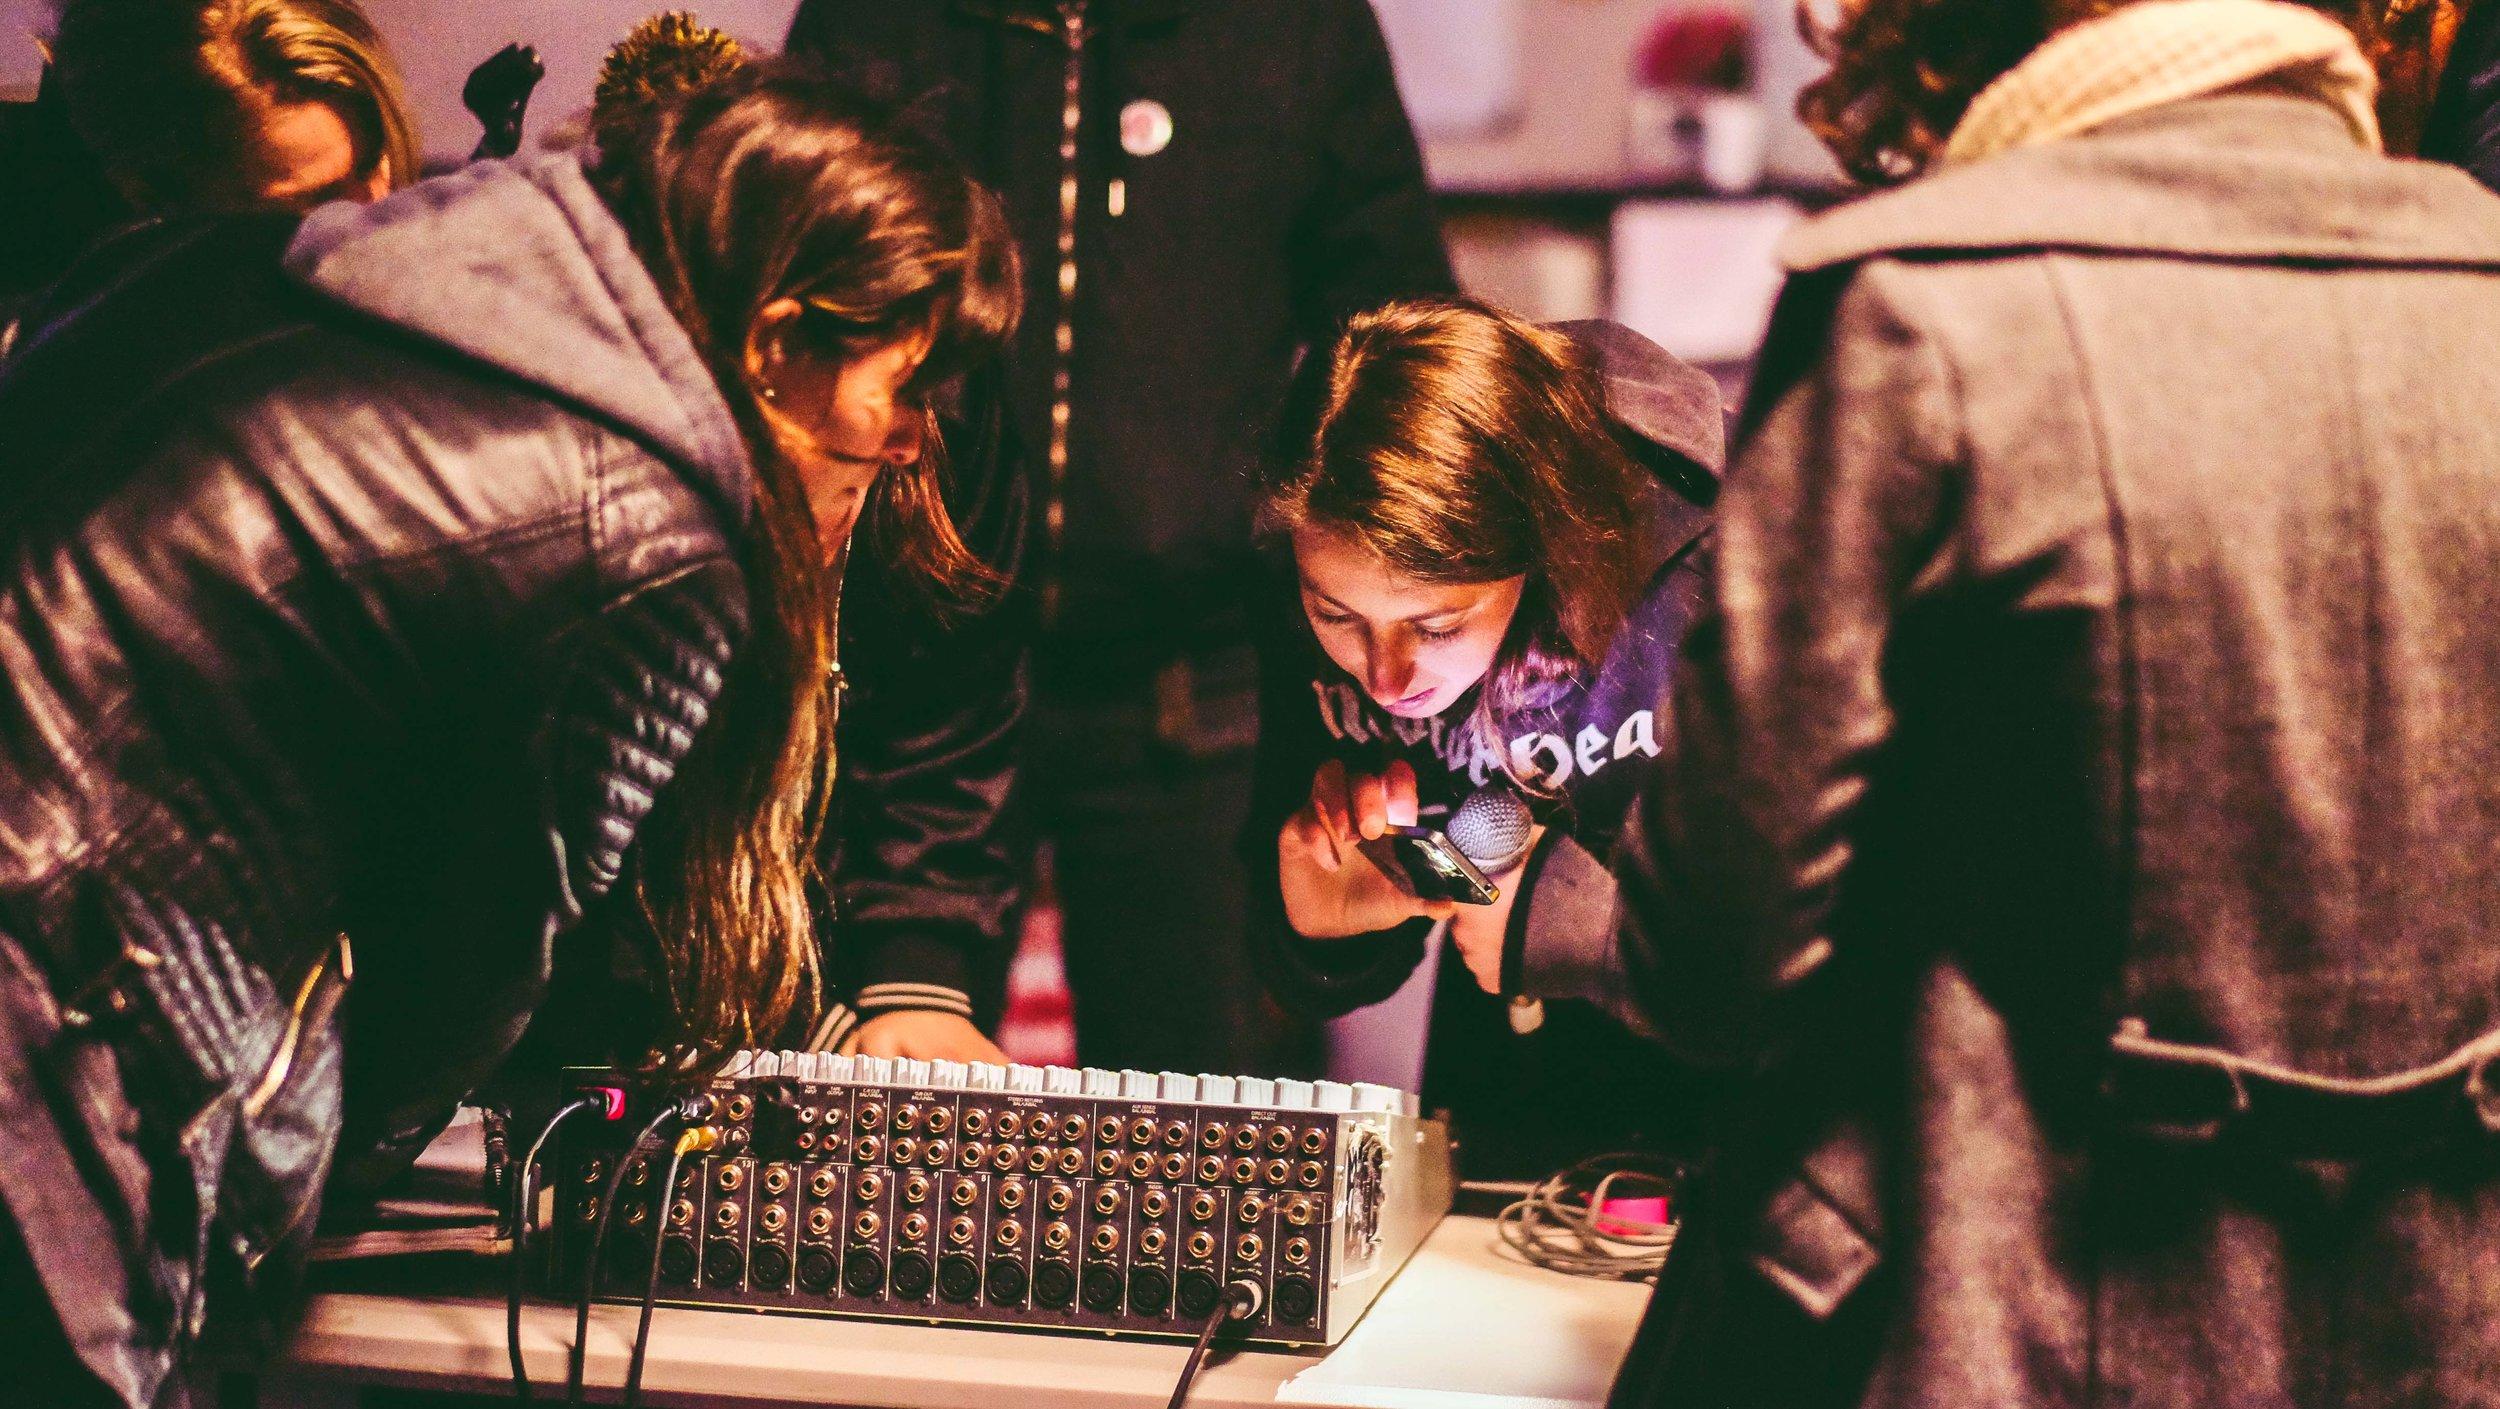 11/7/17: Laura Landsdowne: Live Mixing